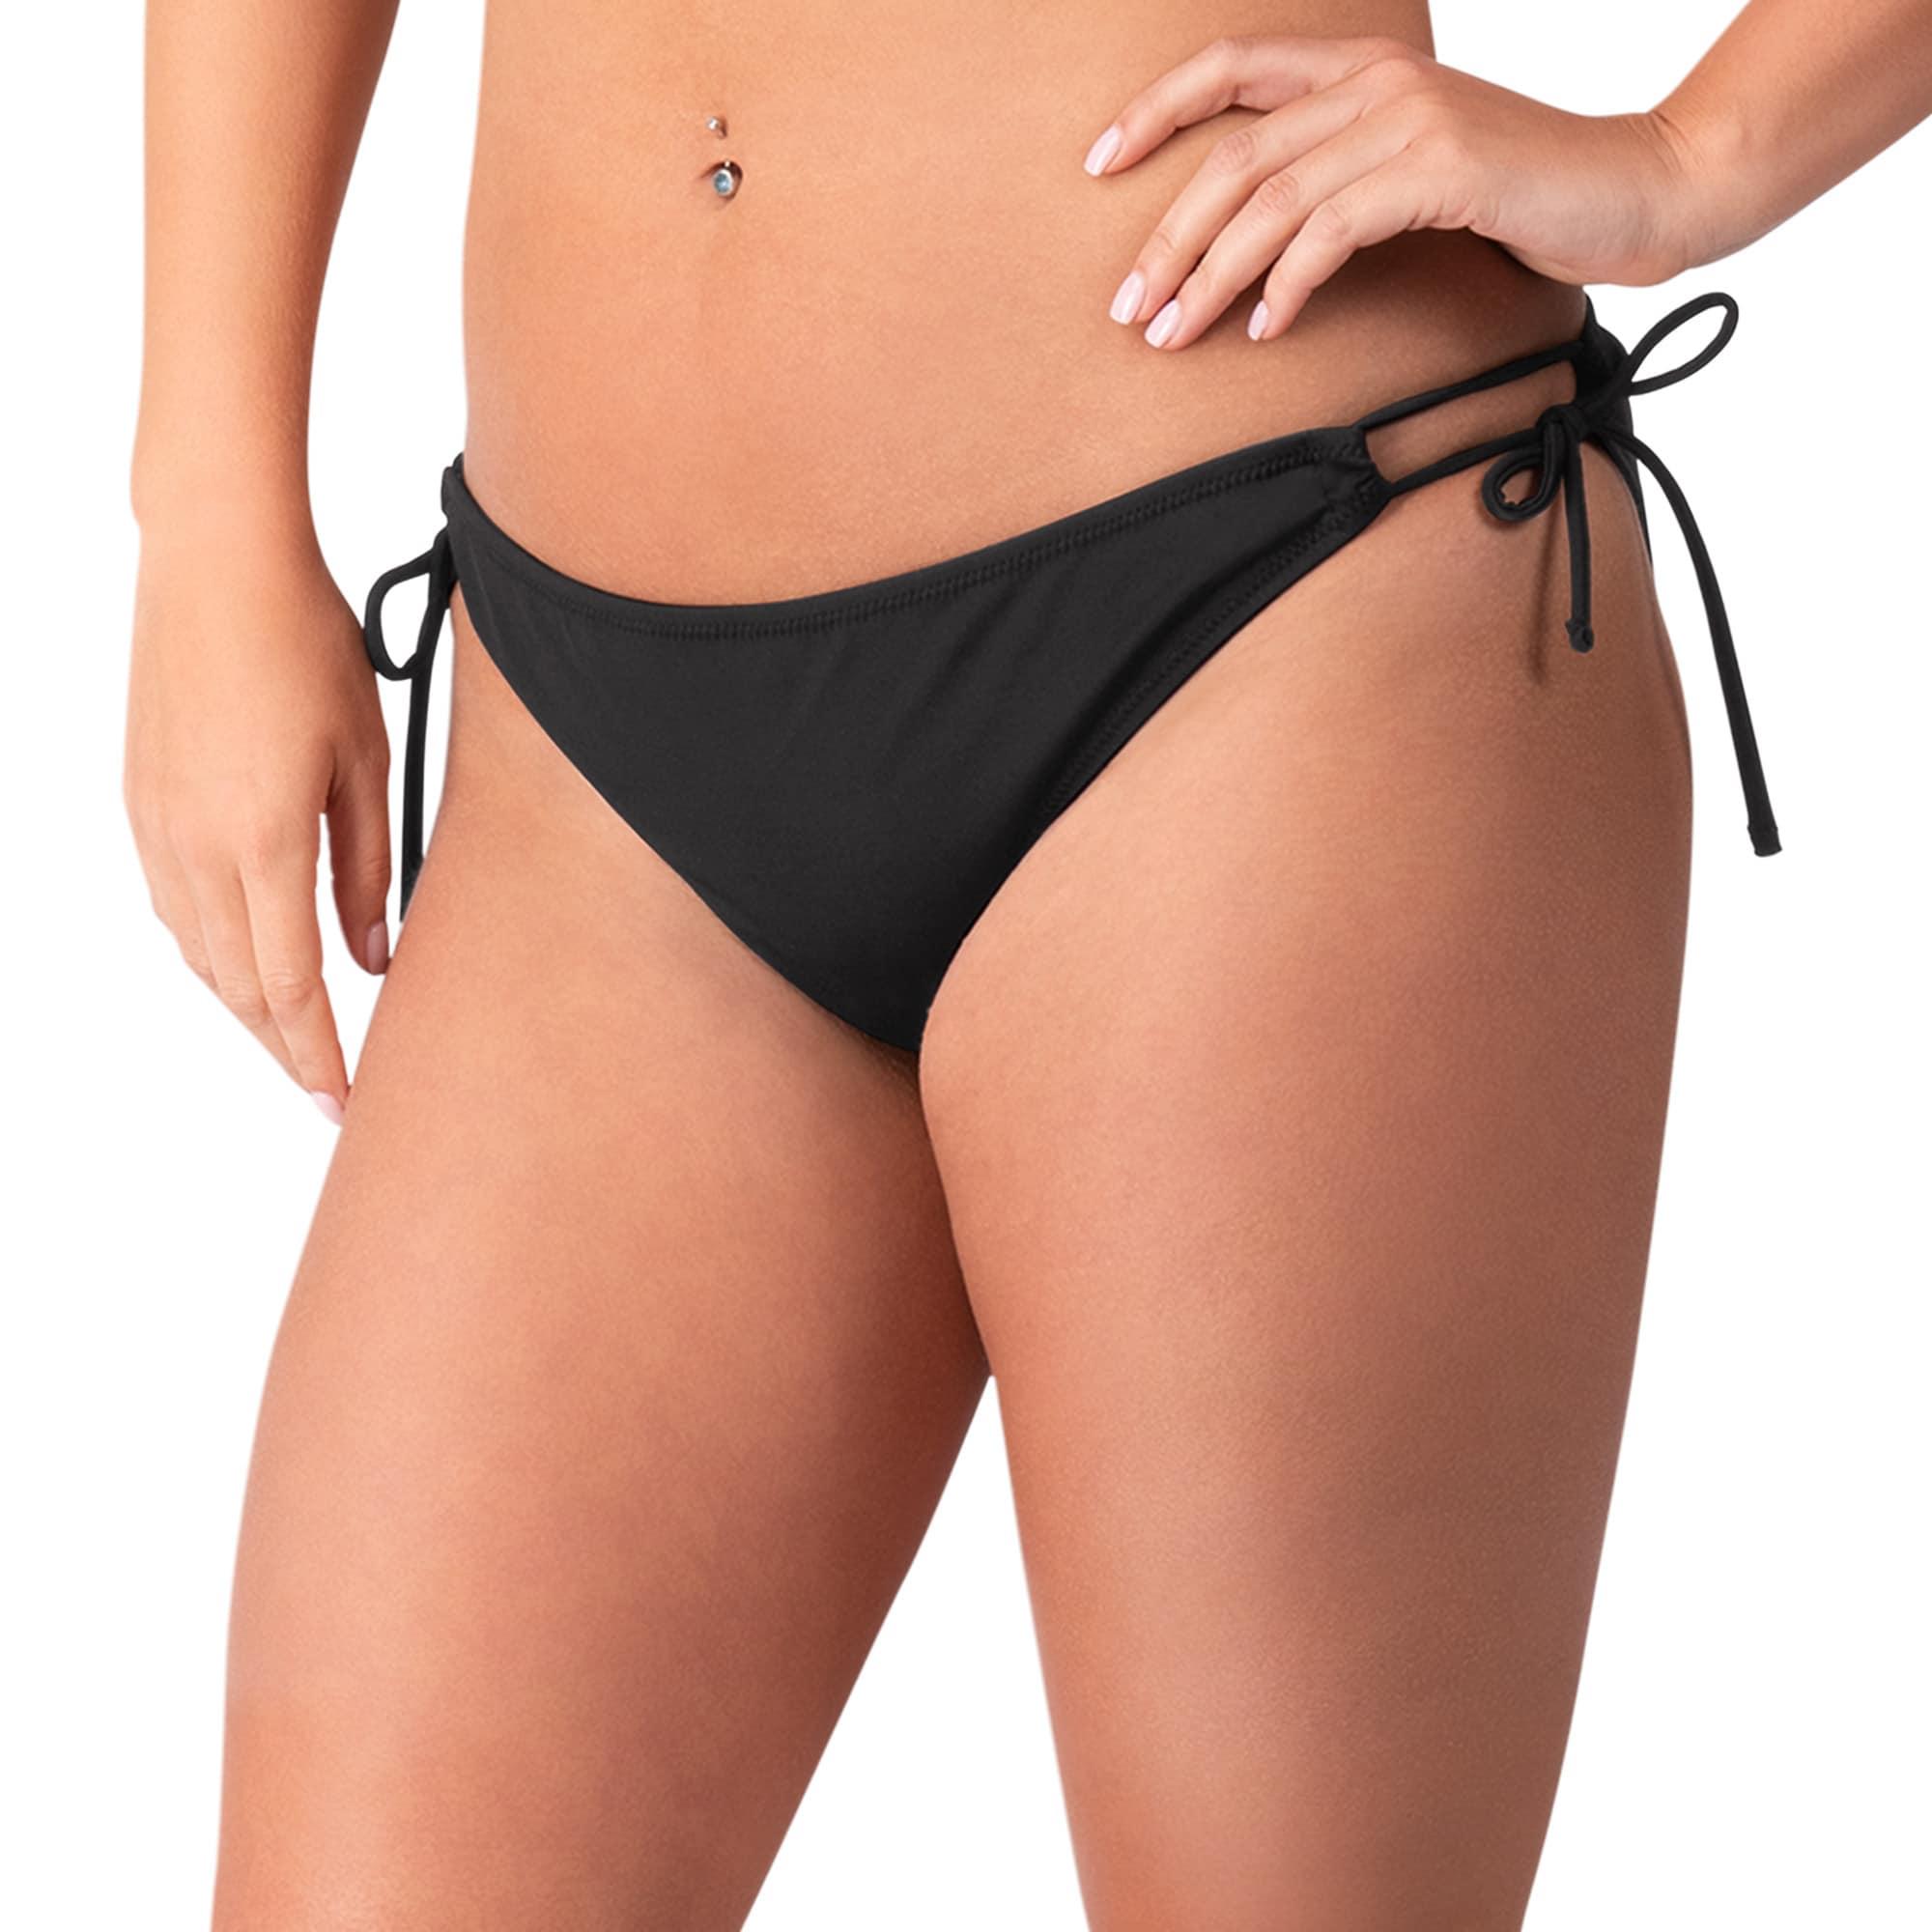 Green Bay Packers G-III 4Her by Carl Banks Women's Without Limits Bikini Bottom - Black